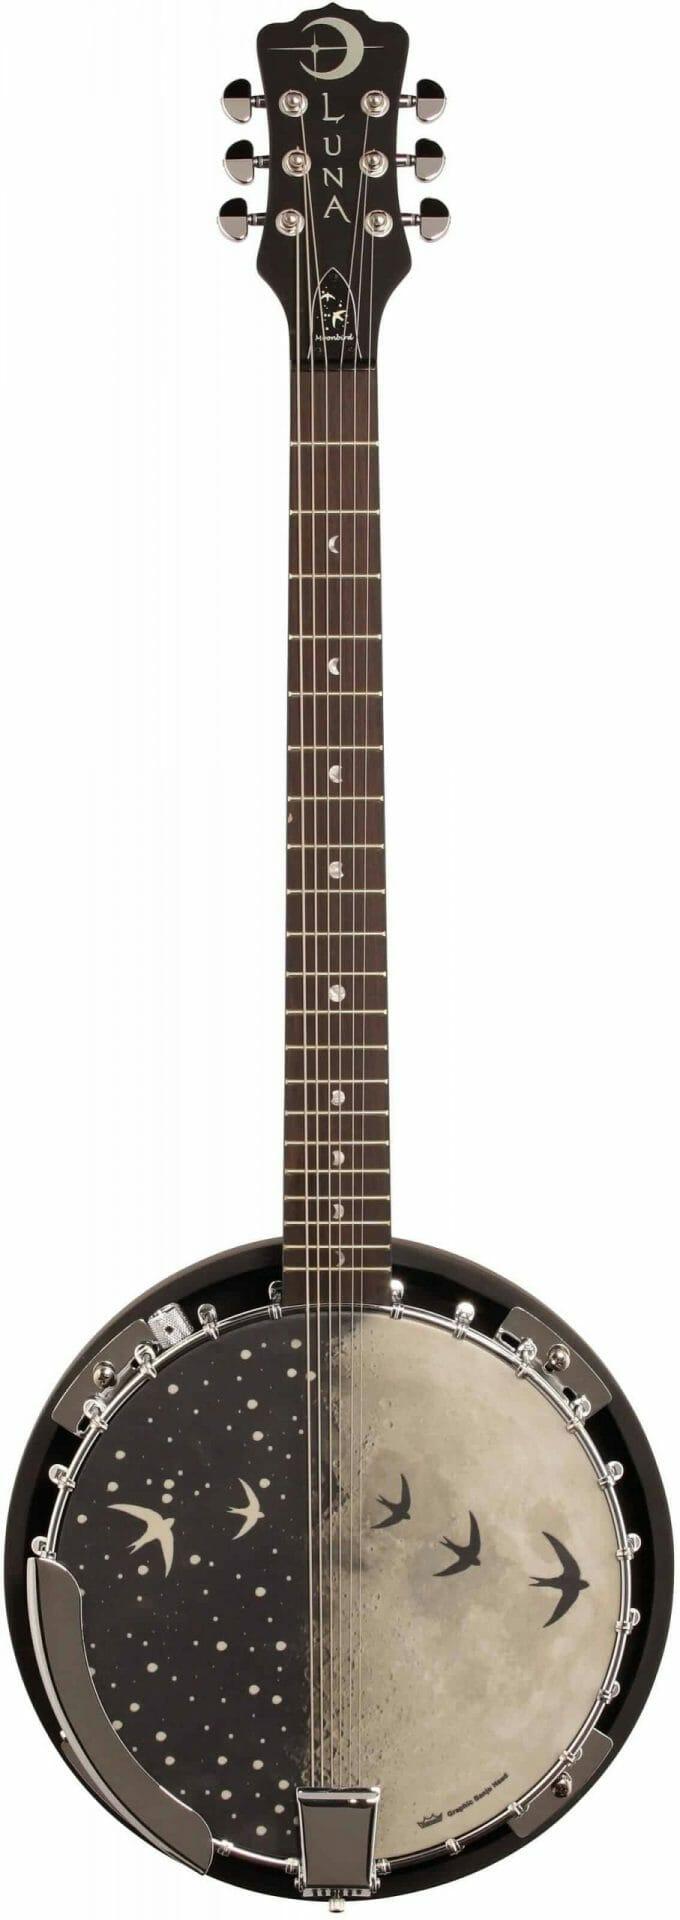 6 string banjo: Luna Moonbird Review